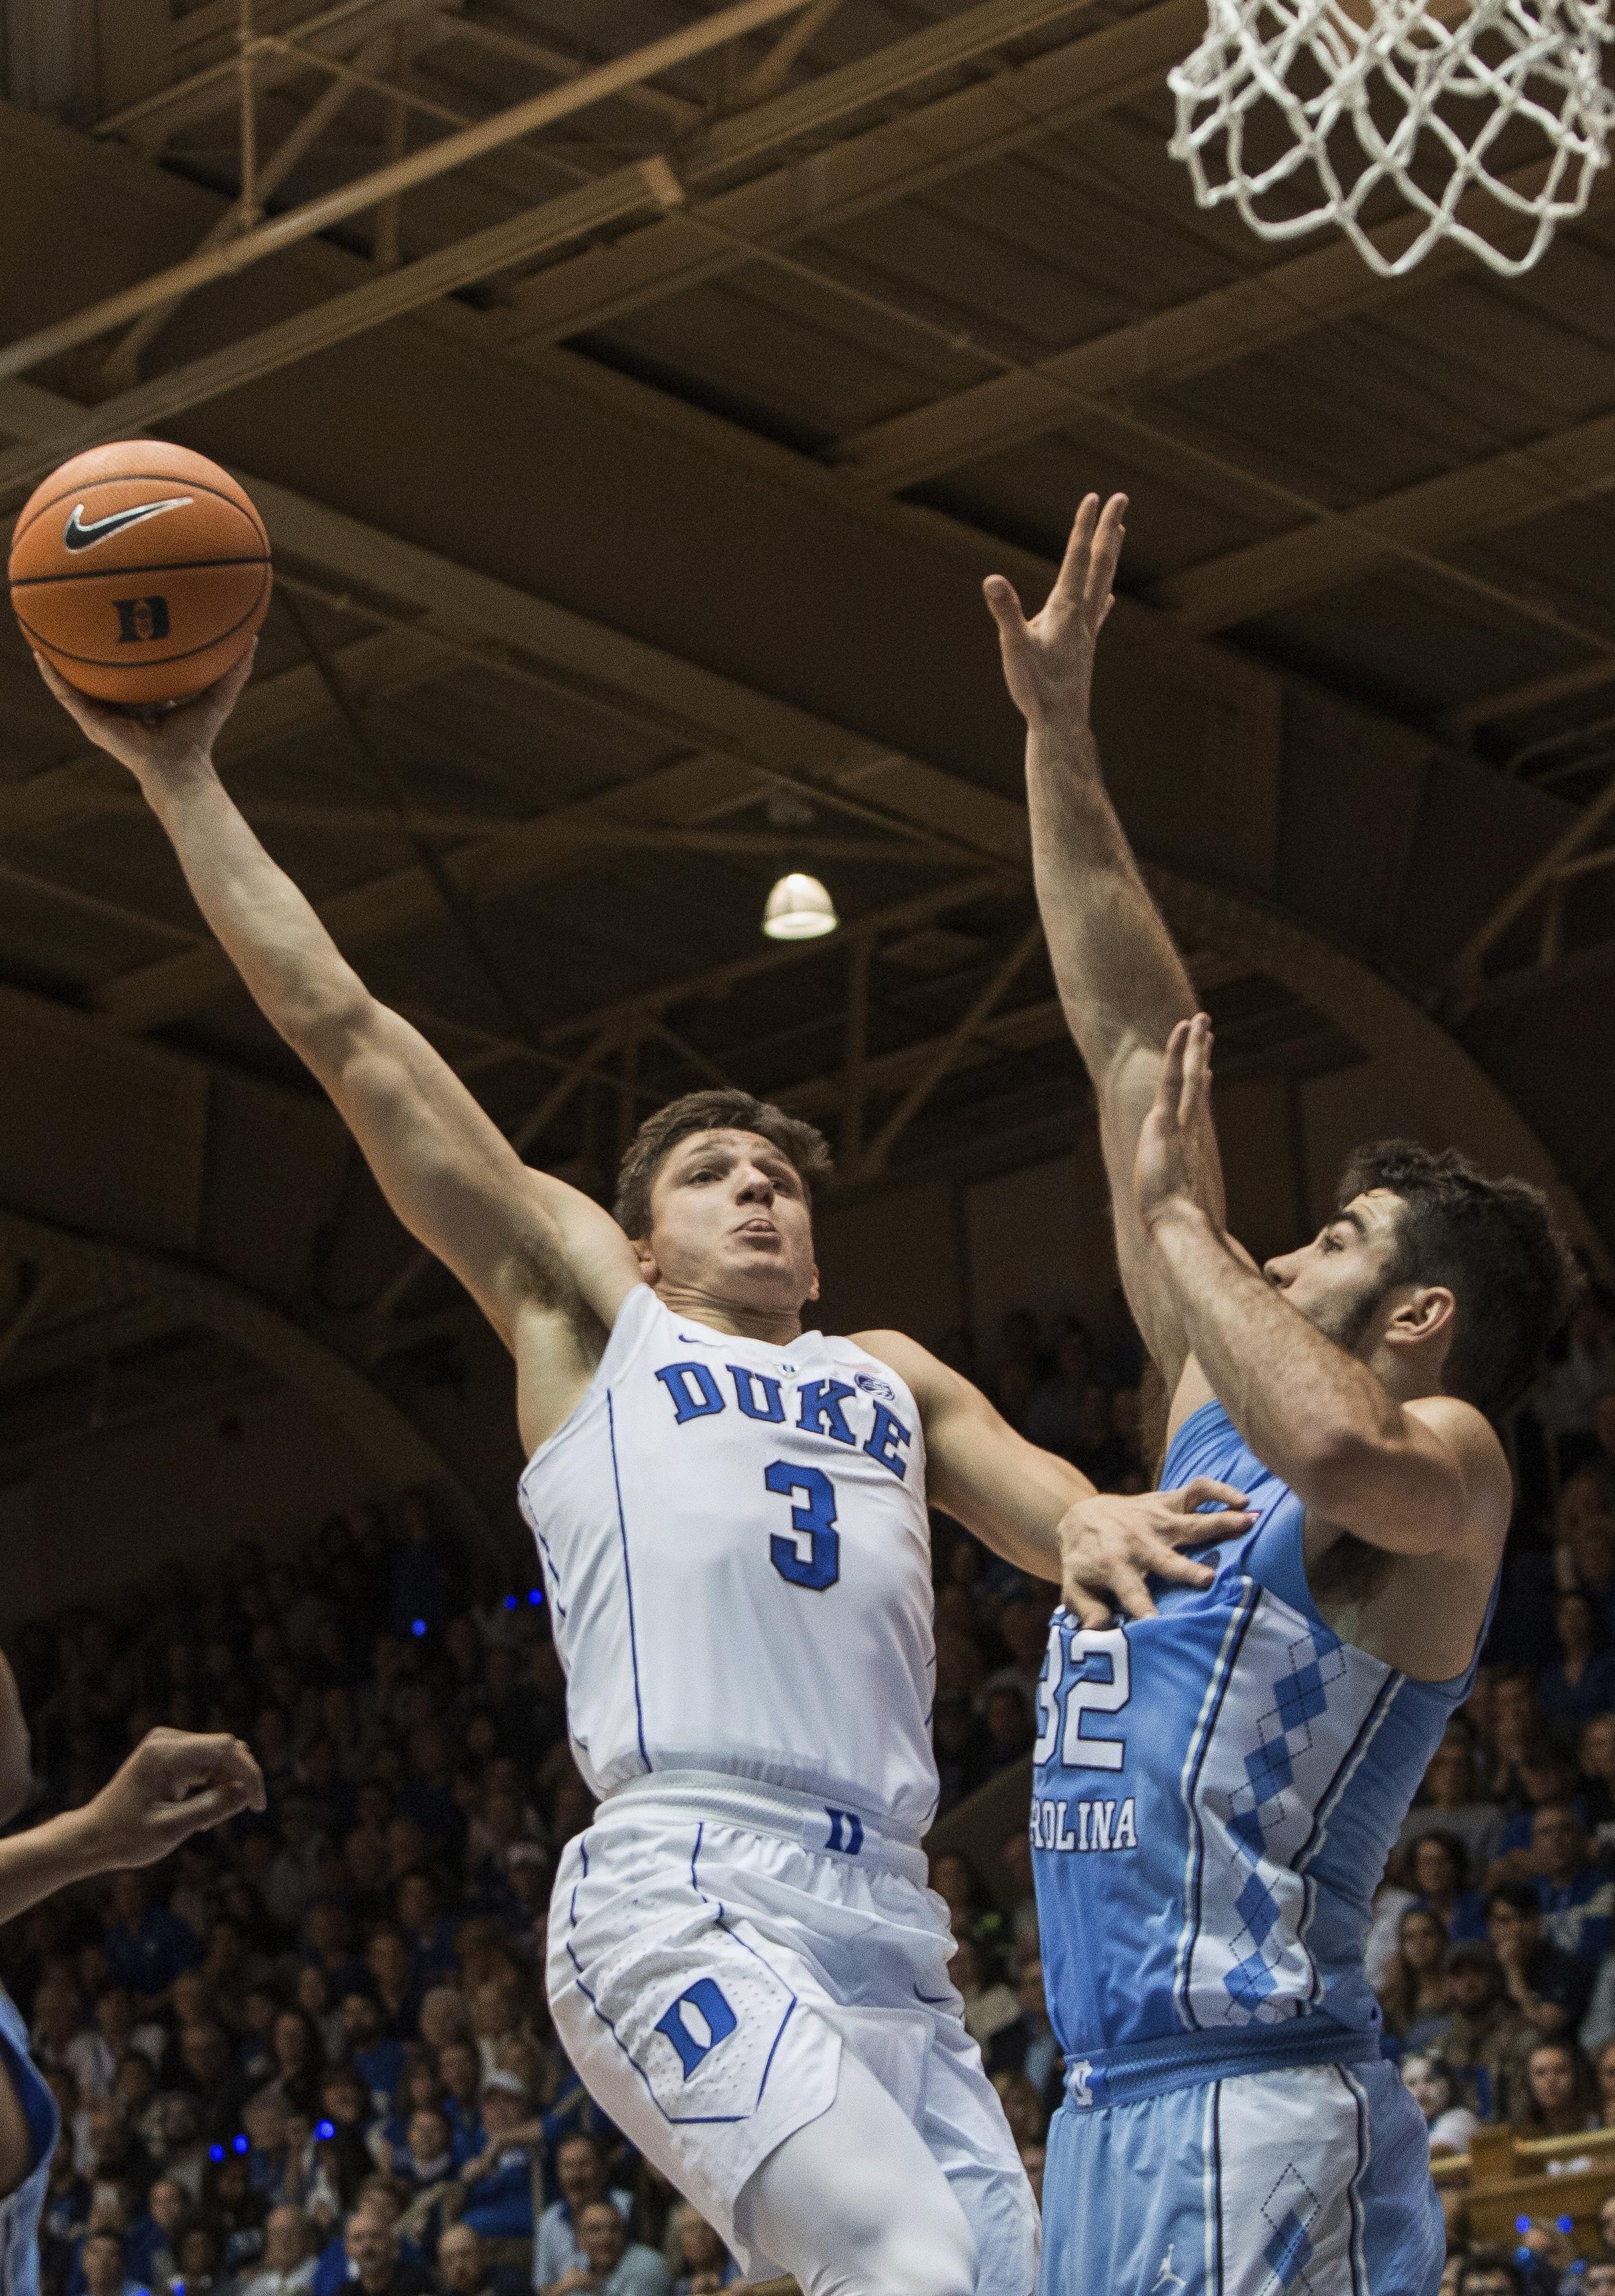 <div class='meta'><div class='origin-logo' data-origin='none'></div><span class='caption-text' data-credit='AP Photo/Ben McKeown'>Duke's Grayson Allen (3) jumps to attempt a dunk against North Carolina's Luke Maye (32) during the first half of an NCAA college basketball game</span></div>